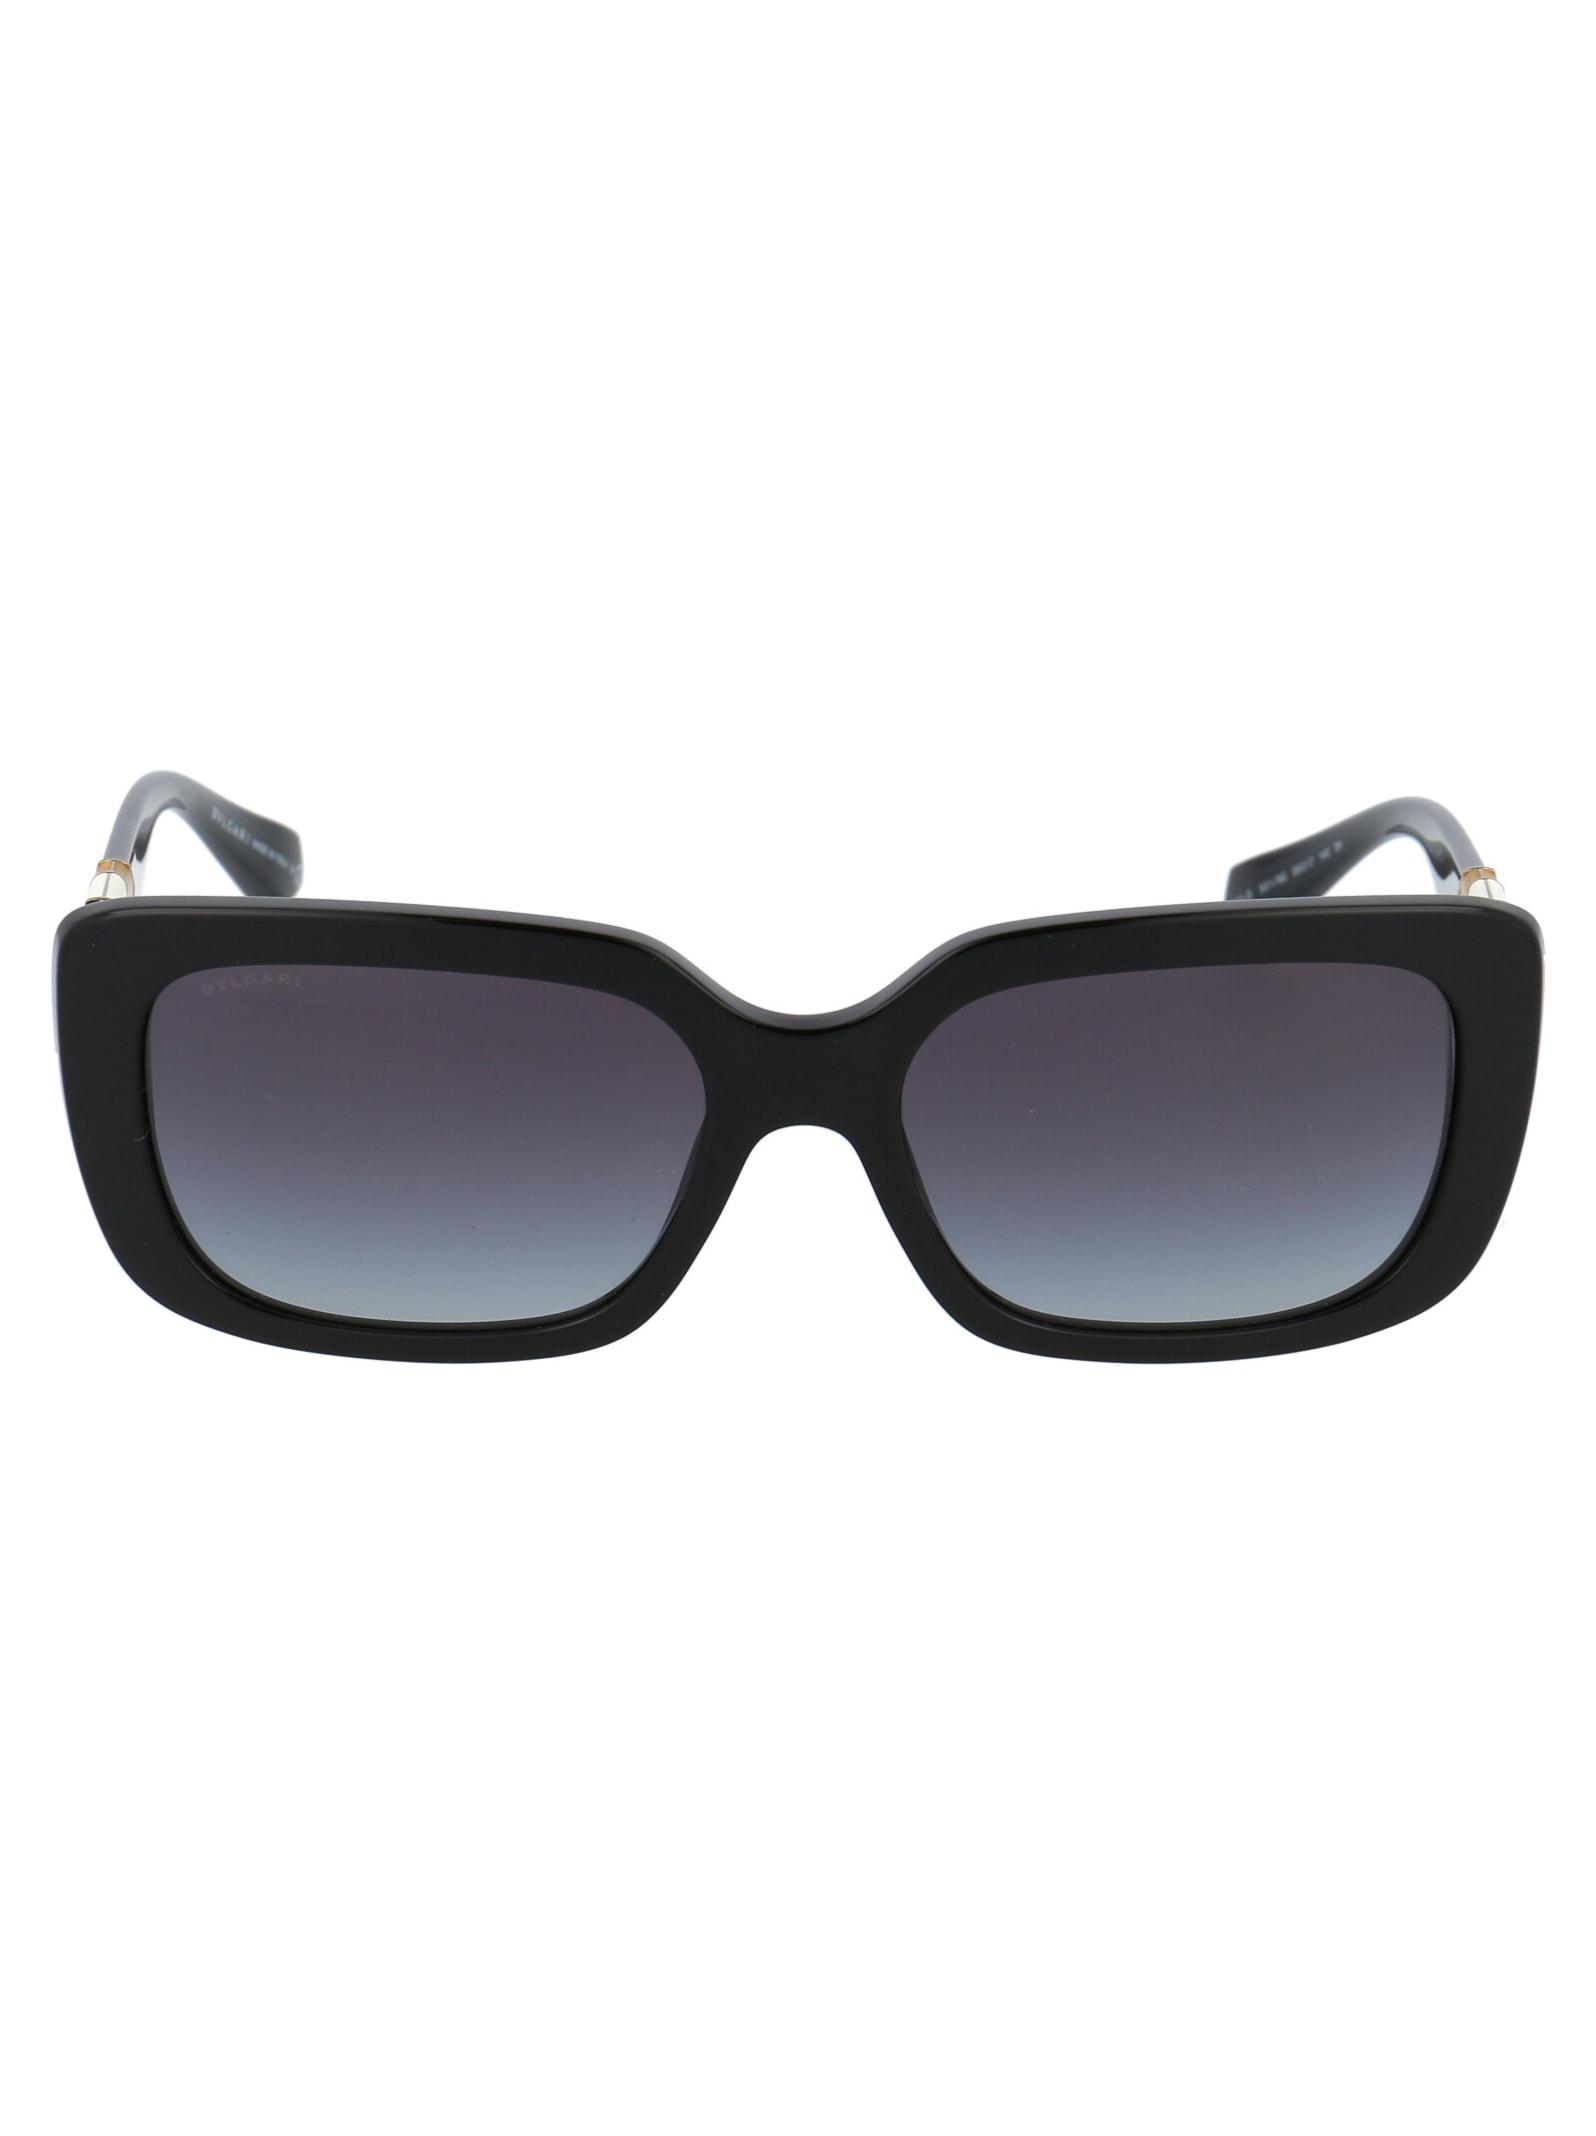 0bv8223b Sunglasses